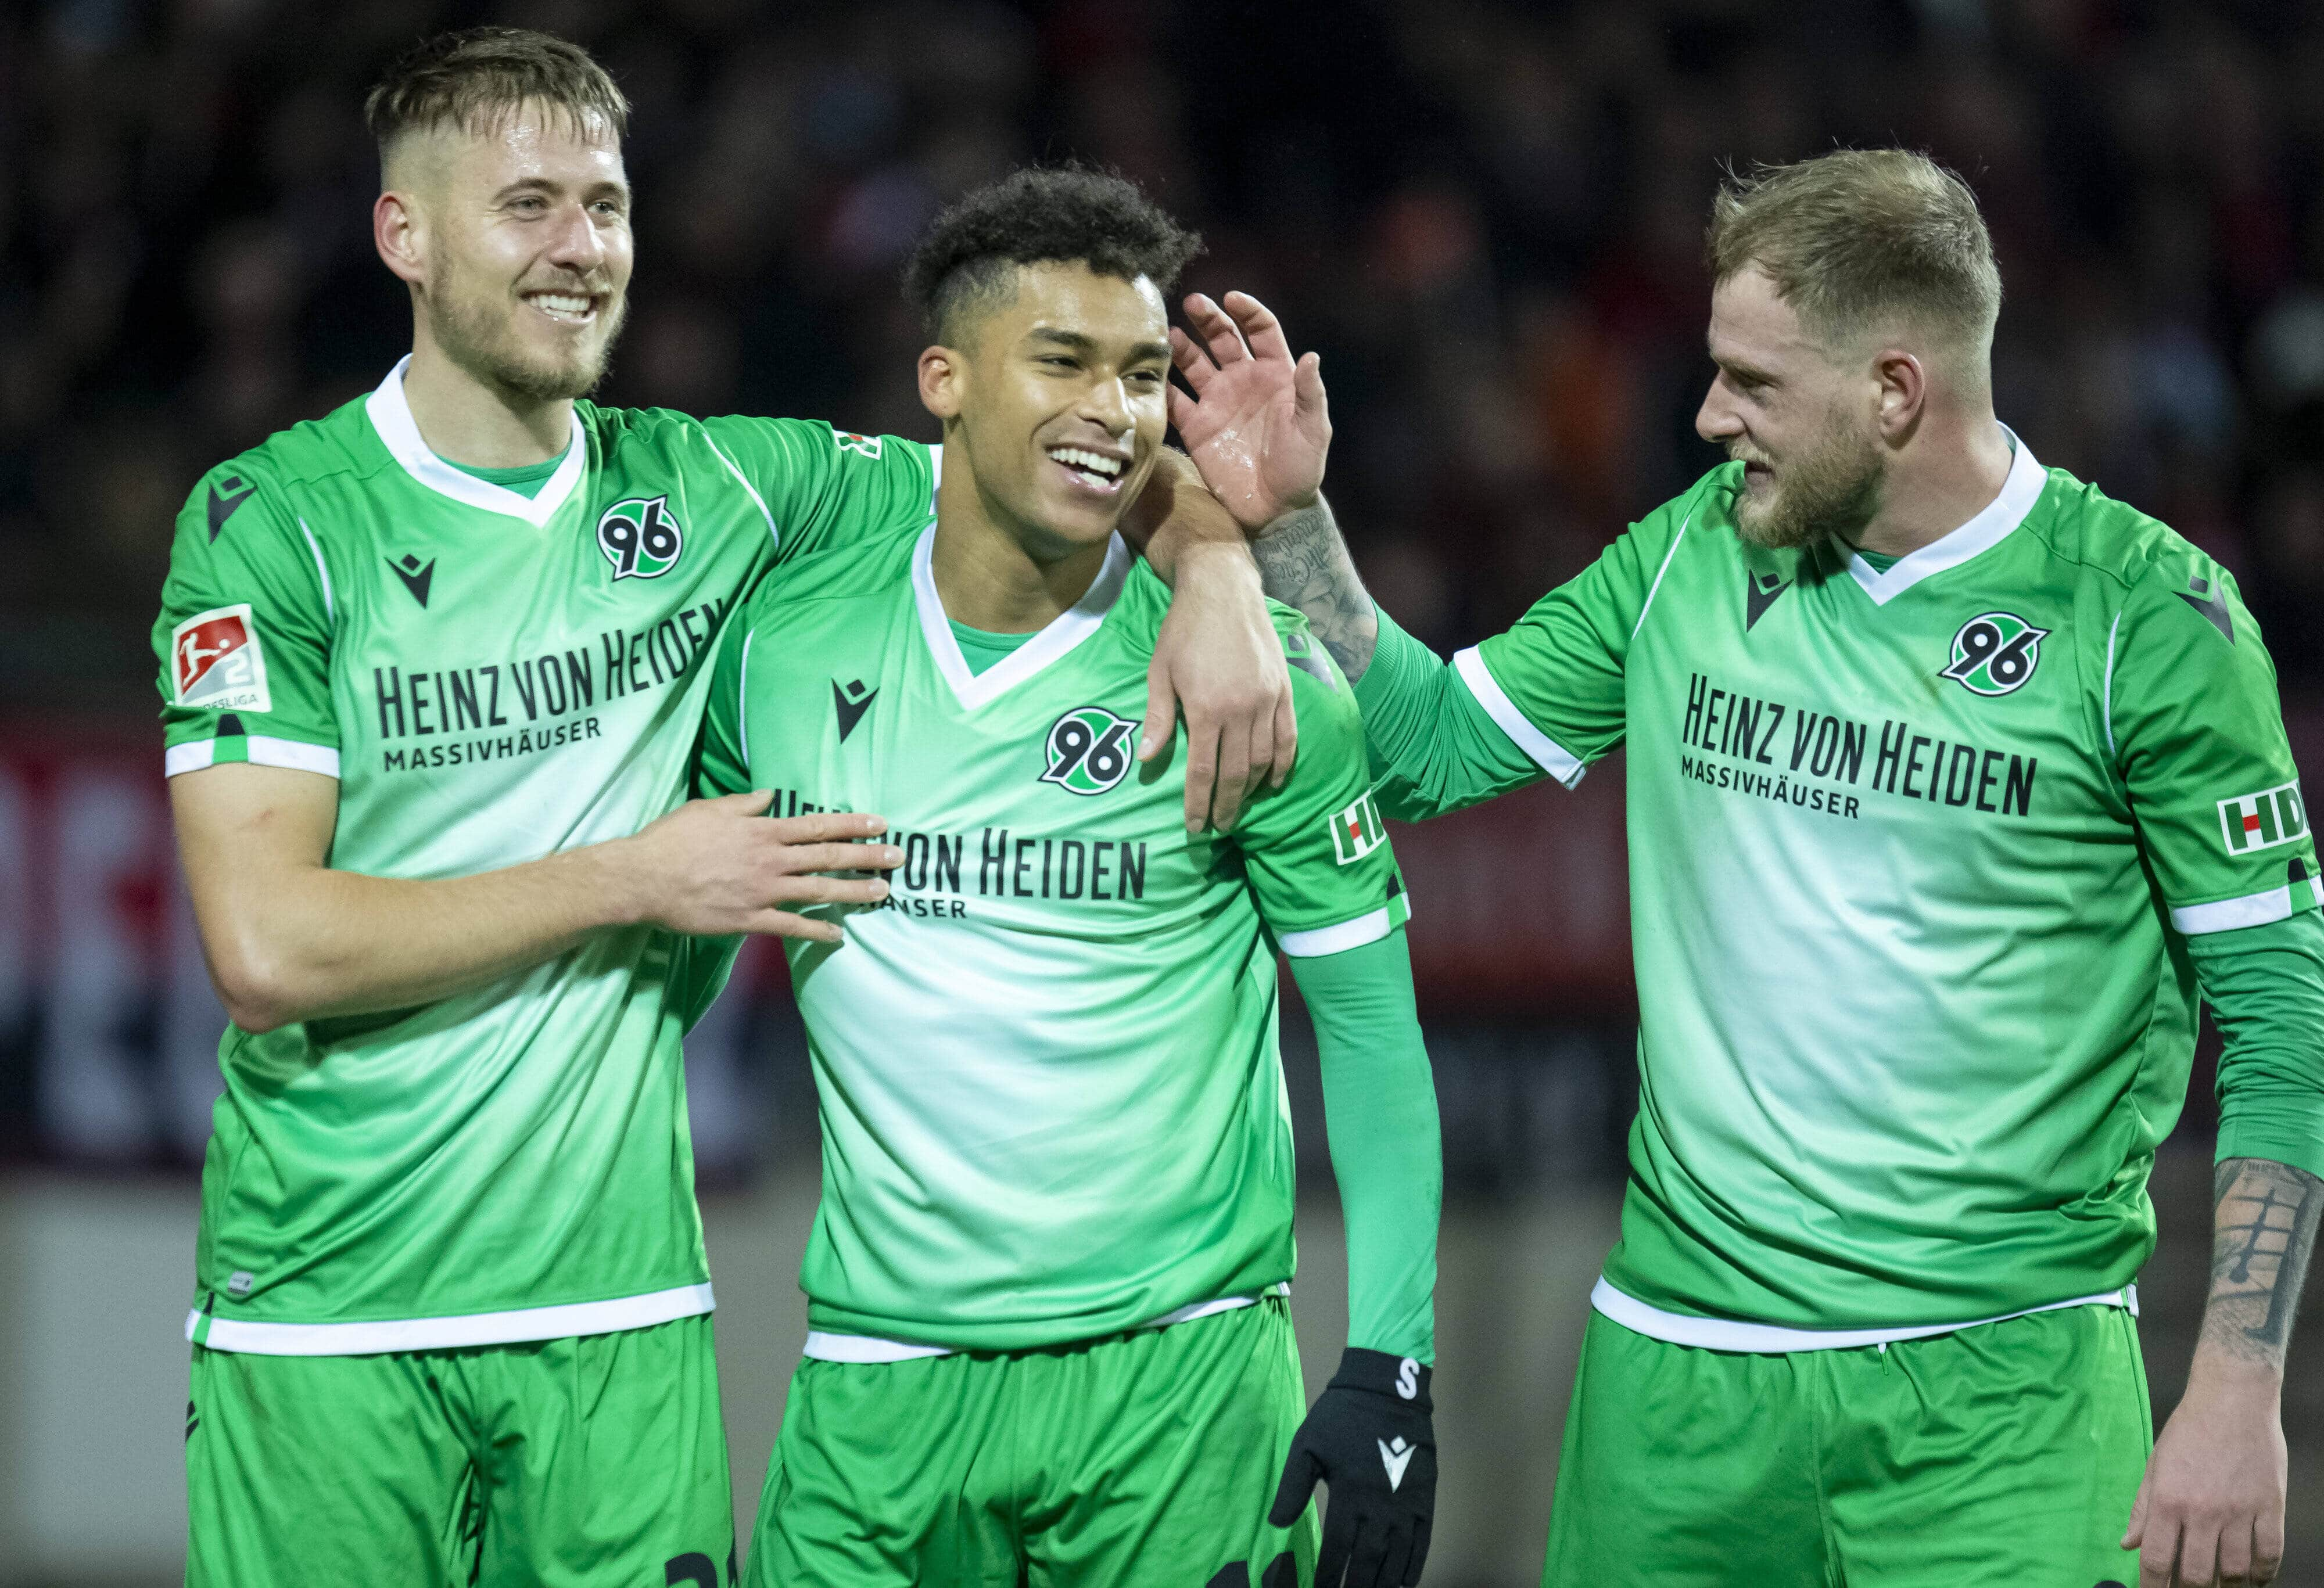 06.03.2020, xomx, Fussball 2.Bundesliga, 1. FC Nuernberg – Hannover 96 emspor, v.l. Tor, Goal, Jubel, Torjubel zum 0:2